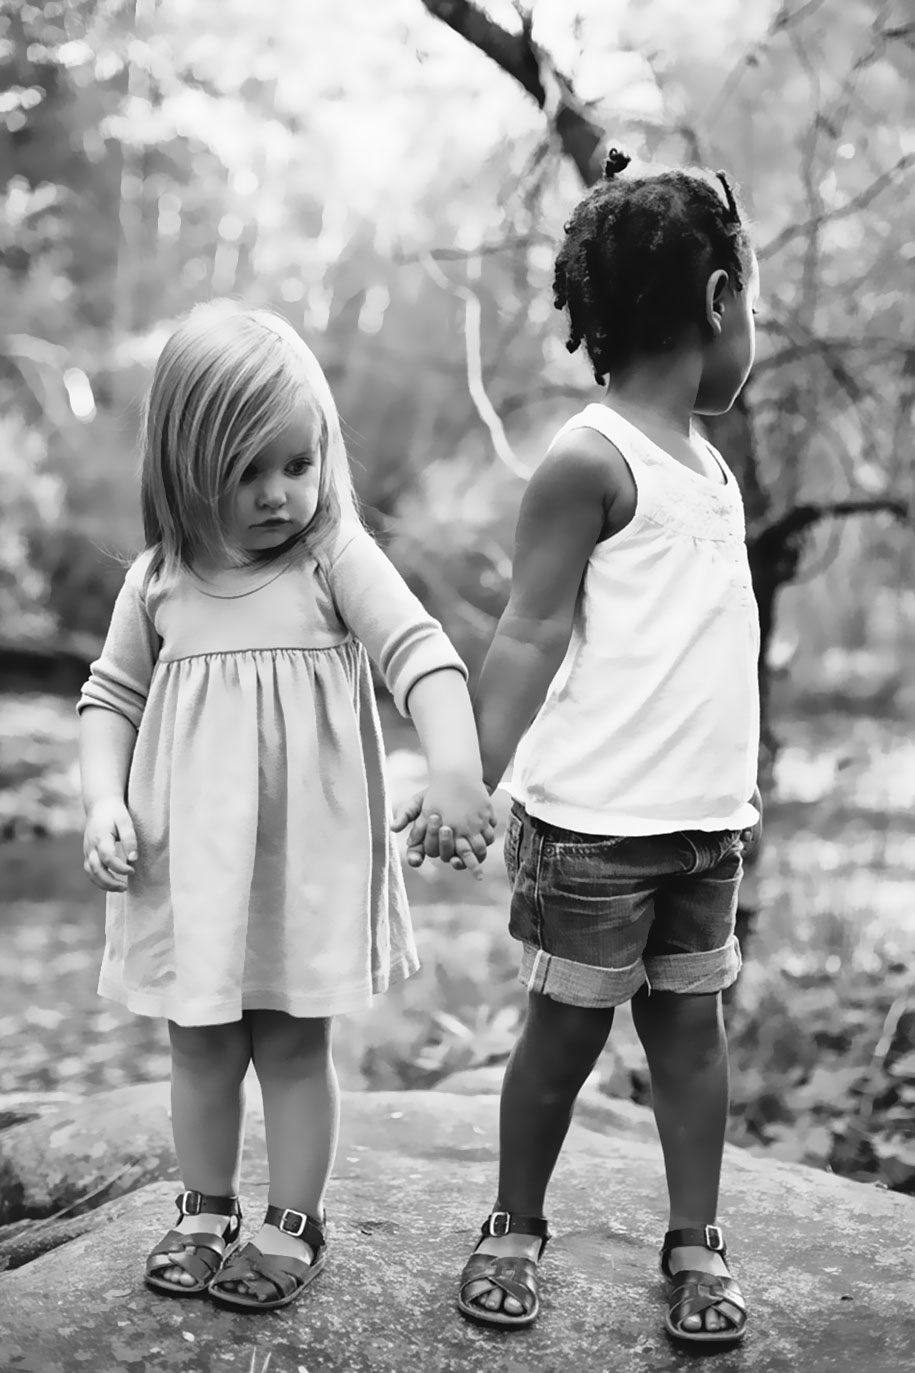 children-photography-adopted-sister-semenesh-haven-anna-larson-3